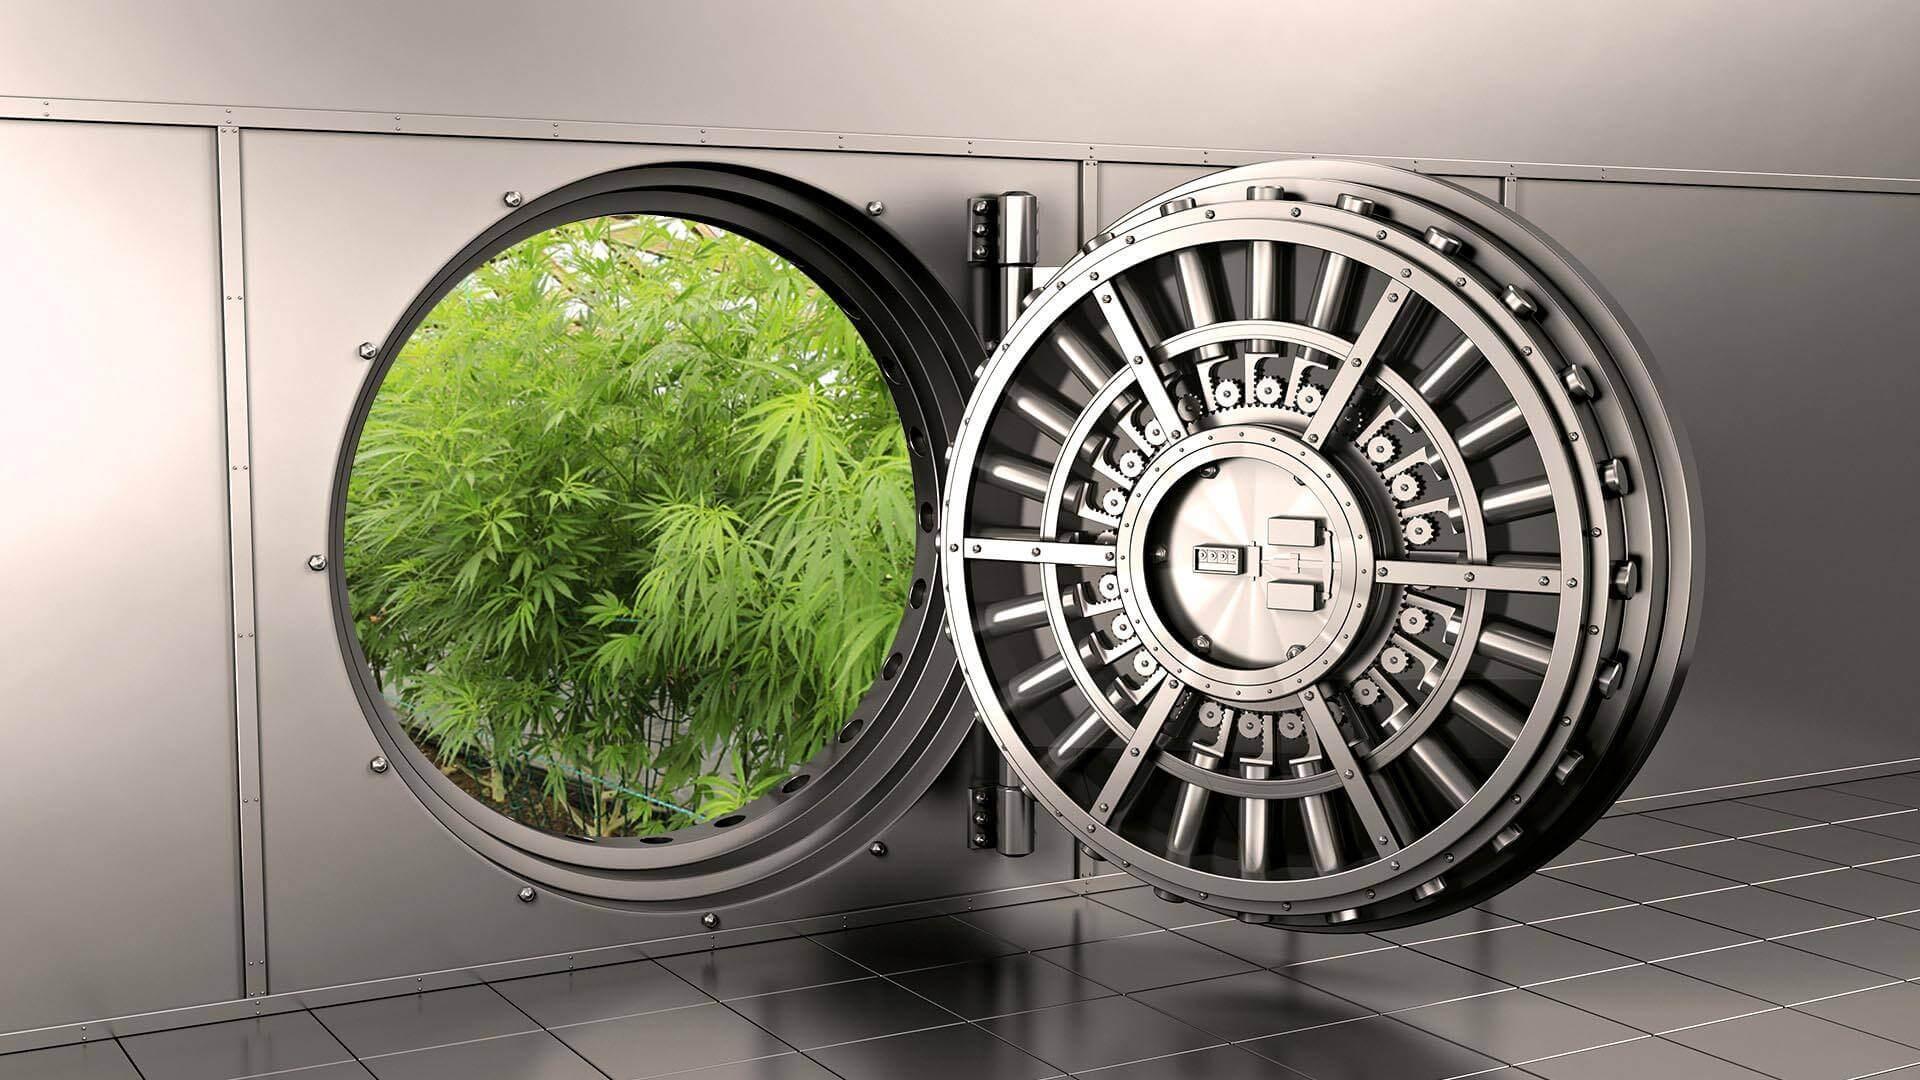 Cannabis cash transport